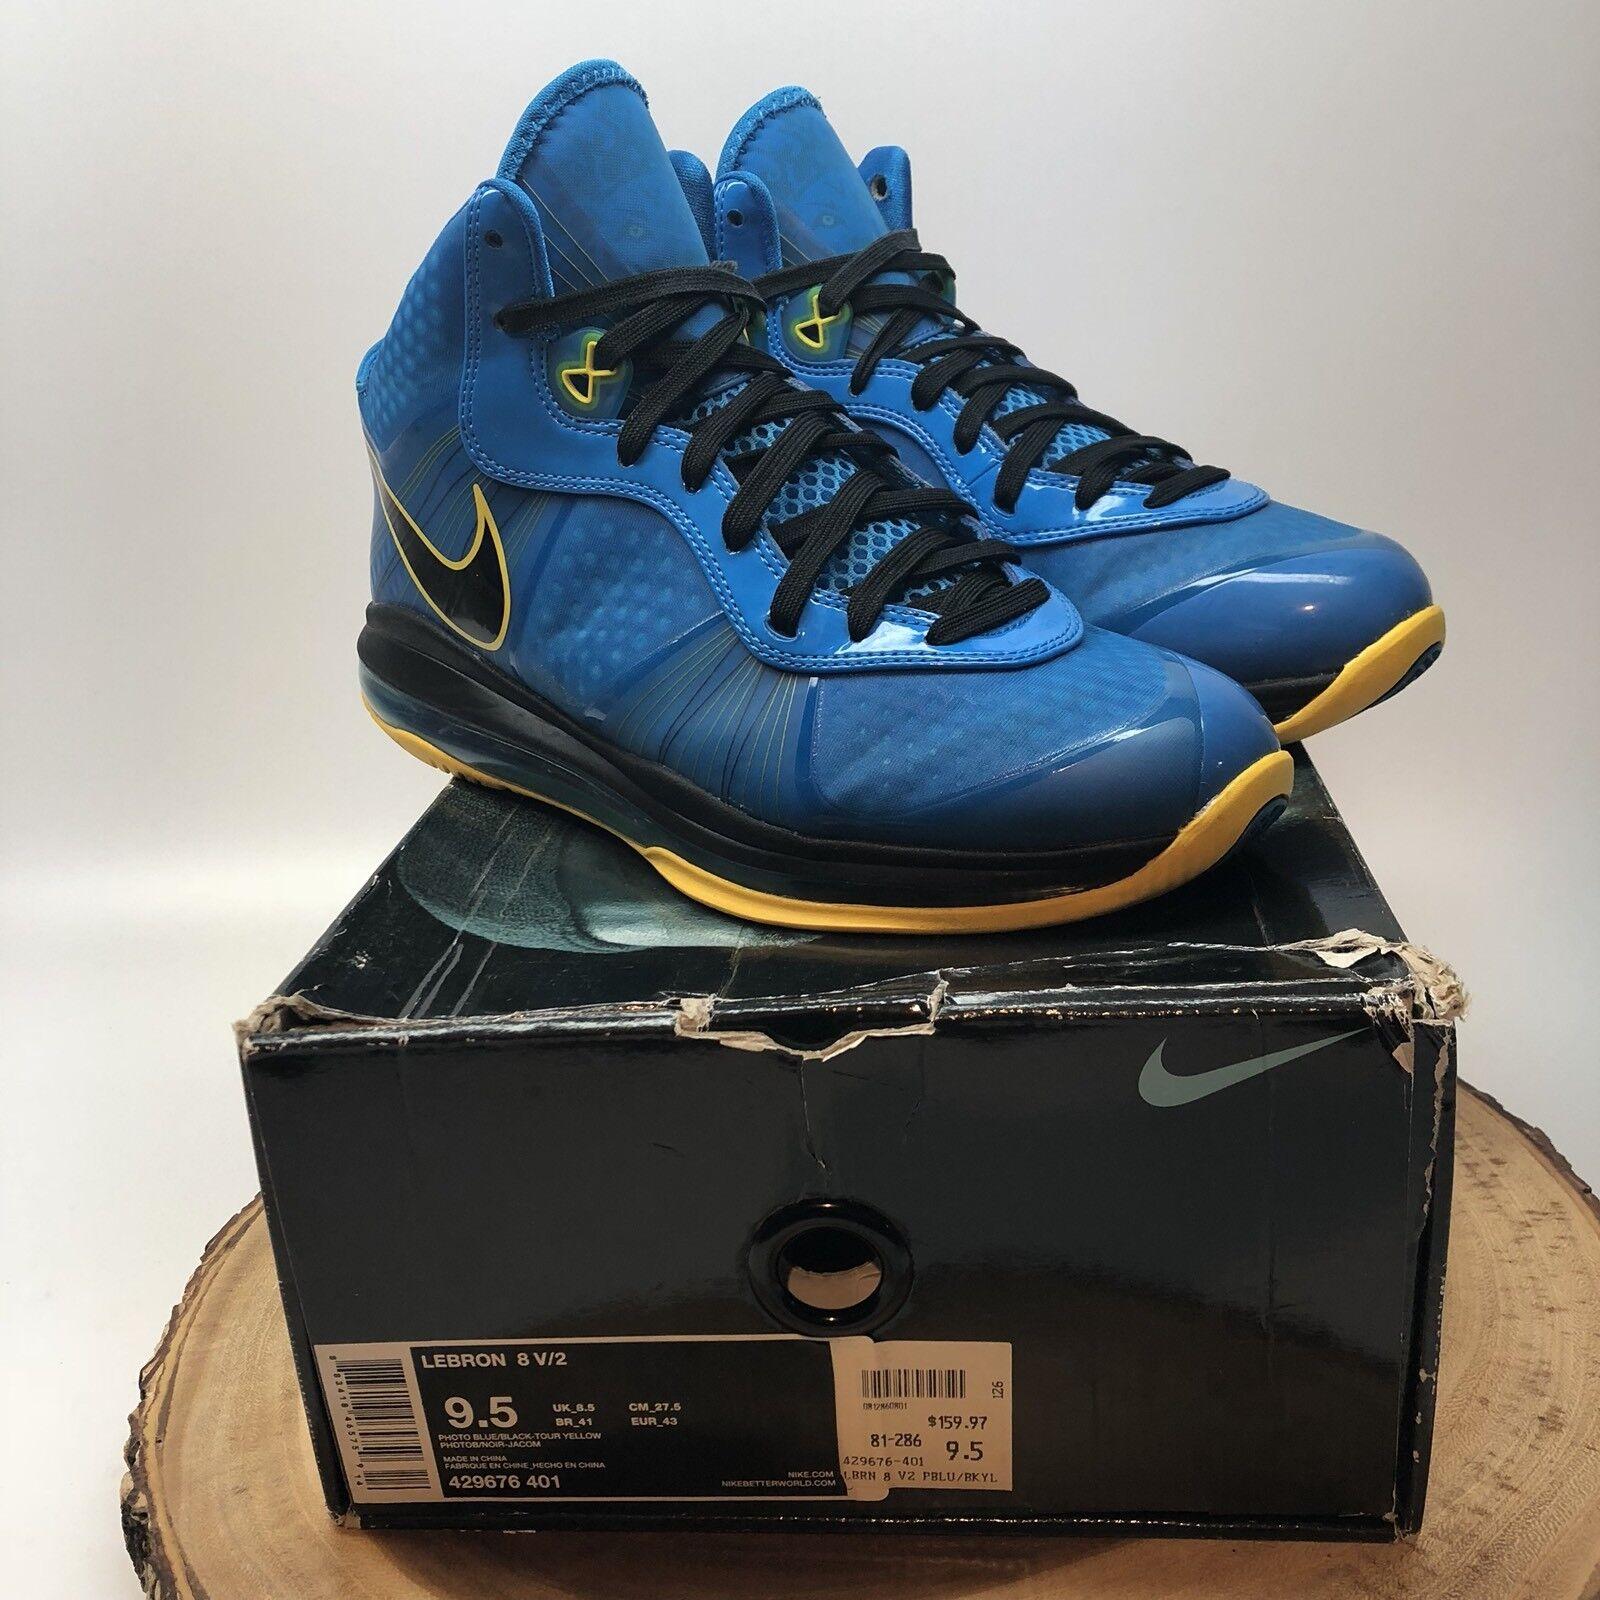 Nike Air Max Max Max LEBRON VIII 8 V/2 ENTOURAGE PHOTO BLUE BLACK YELLOW 429676-401 9.5 37169f